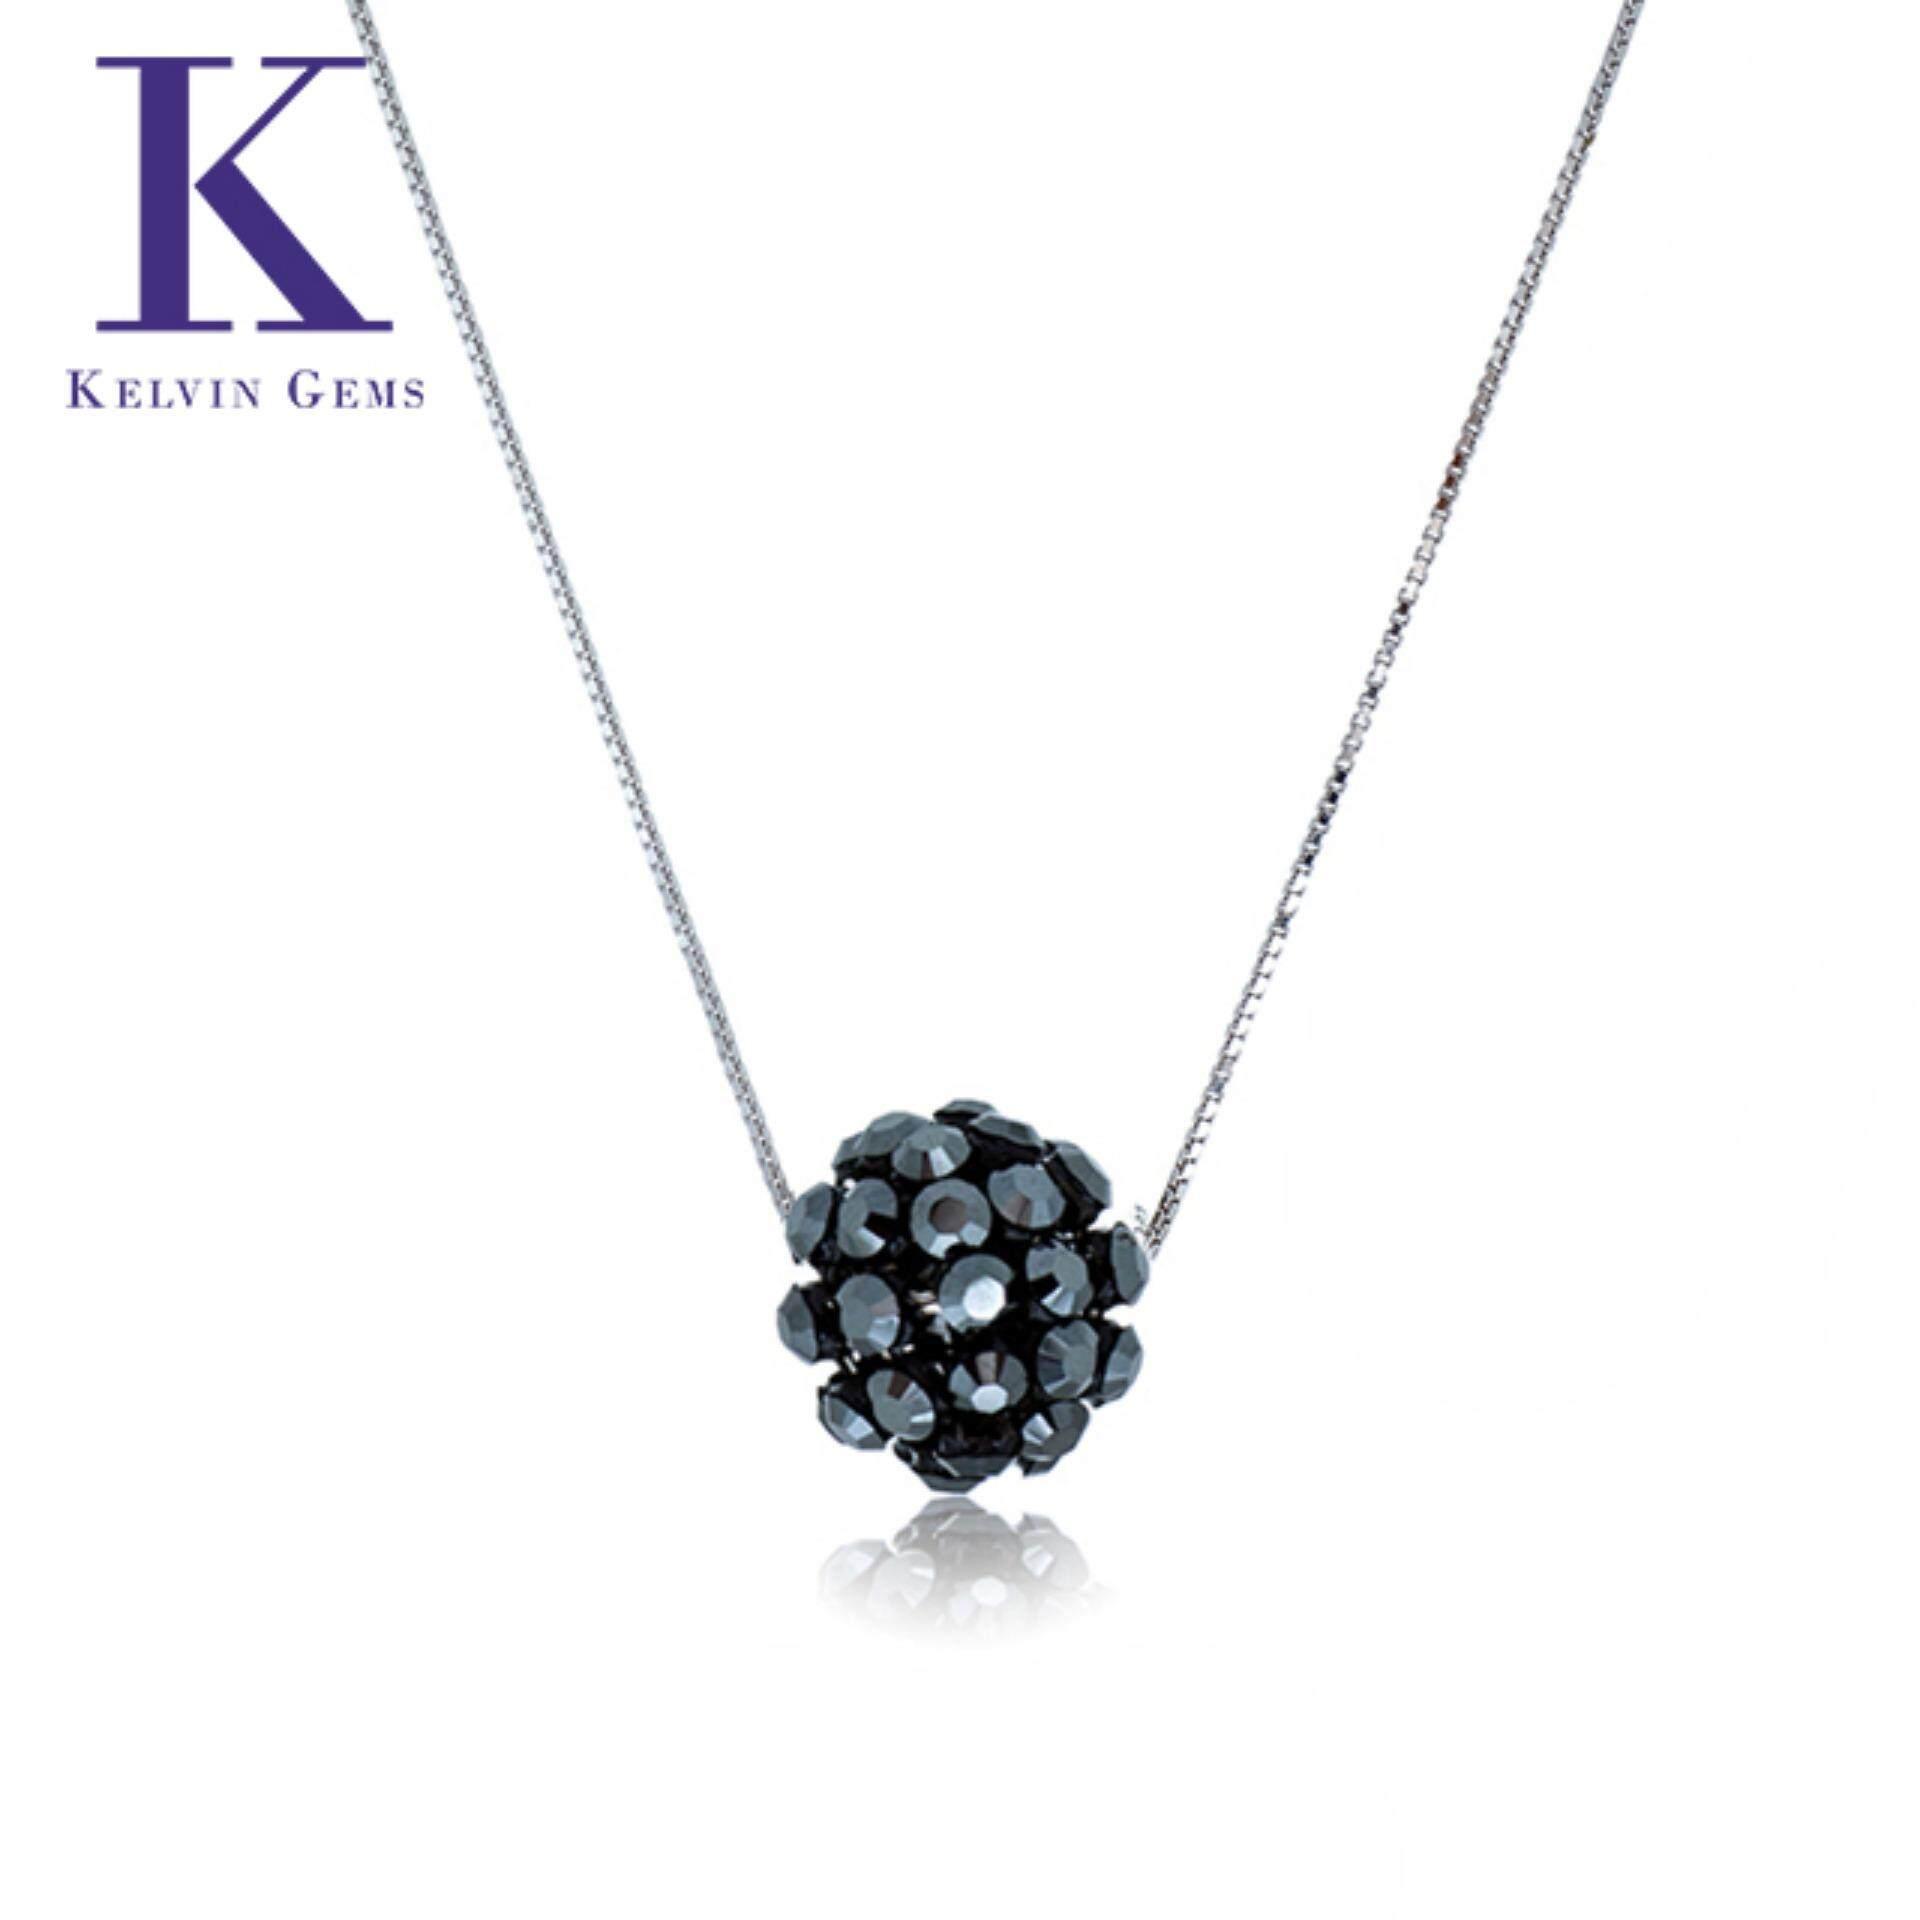 a3168e8006 Kelvin Gems Glam Small Black Diva Ball Pendant Necklace m/w SWAROVSKI  Elements